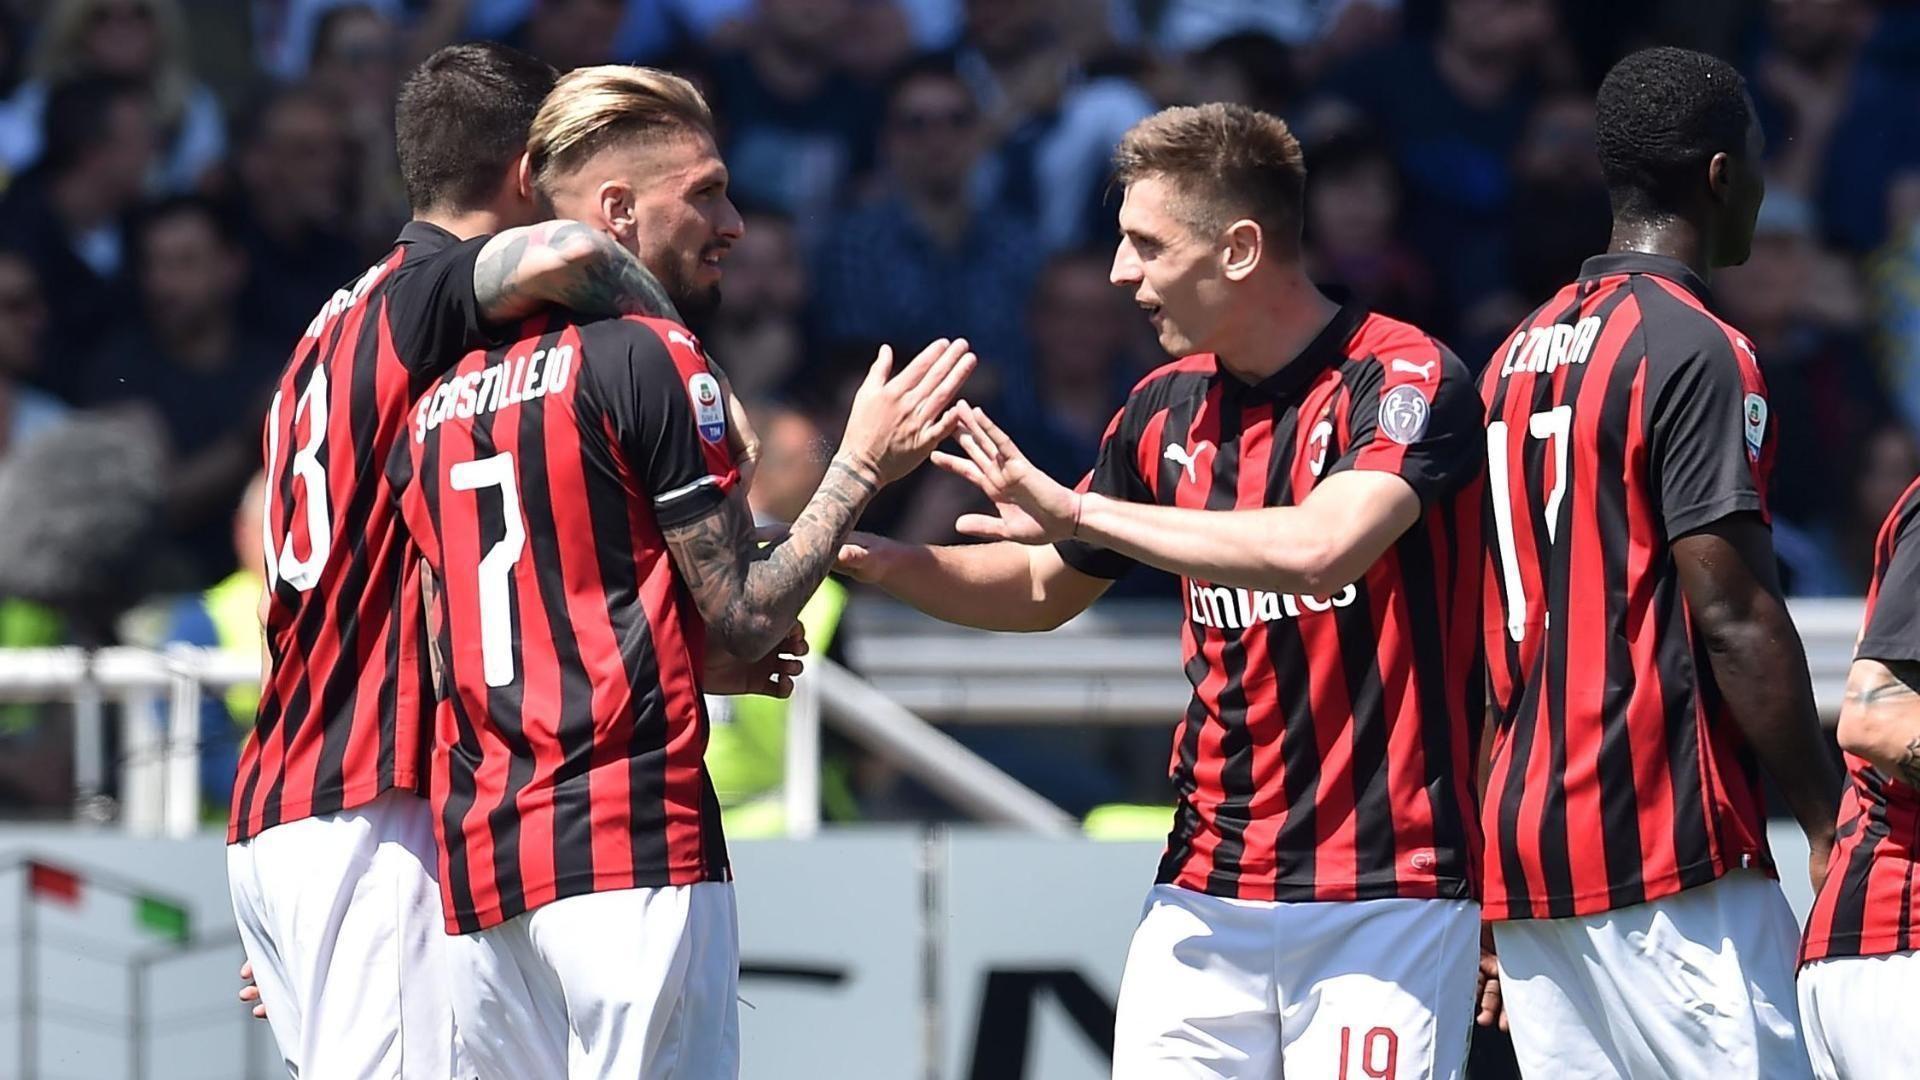 Castillejo's smart header gives Milan the lead